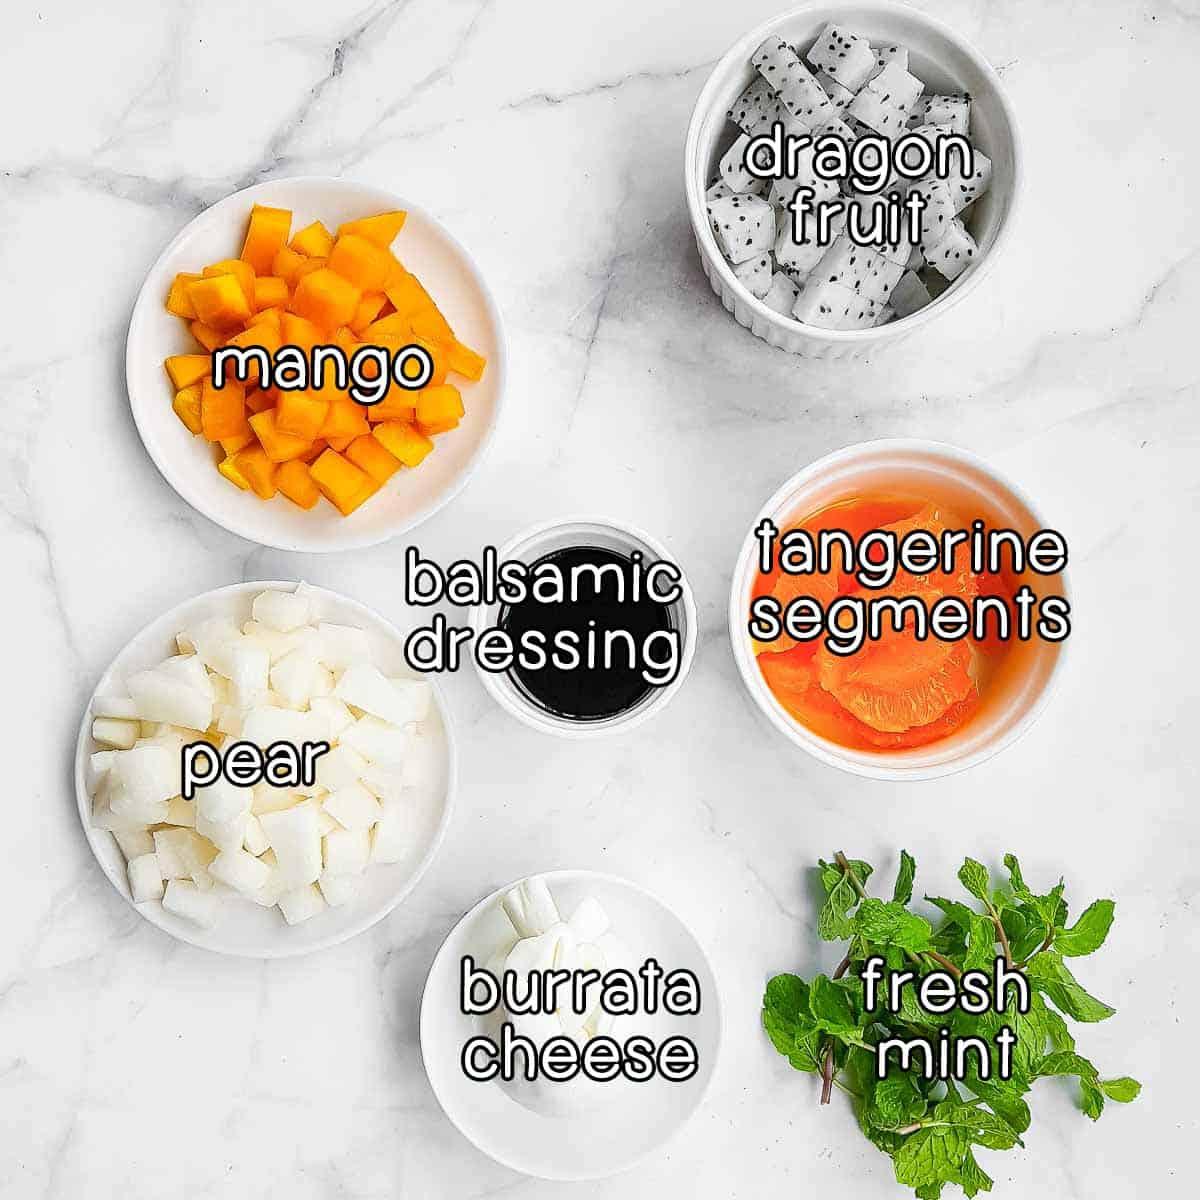 Overhead shot of ingredients- mango, dragon fruit, tangerine segments, pear, balsamic dressing, burrata cheese, and fresh mint.